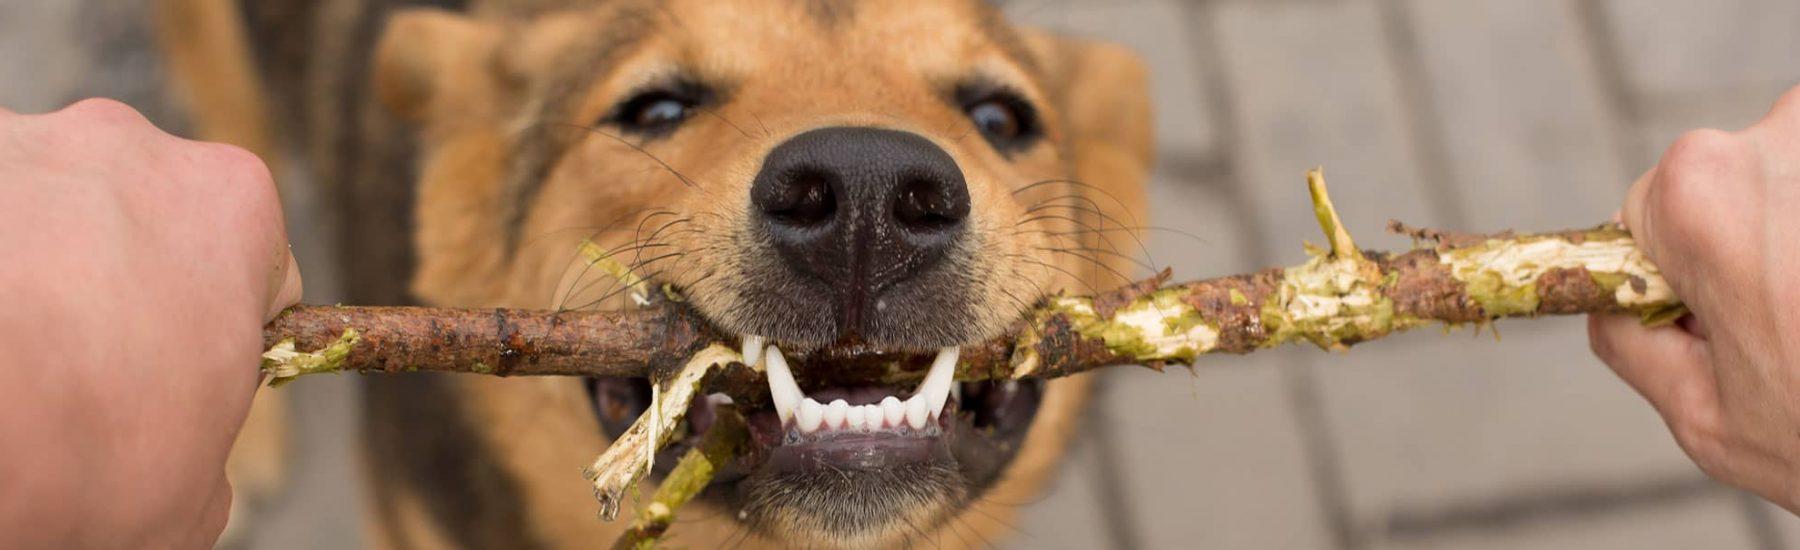 A dog biting a stick.